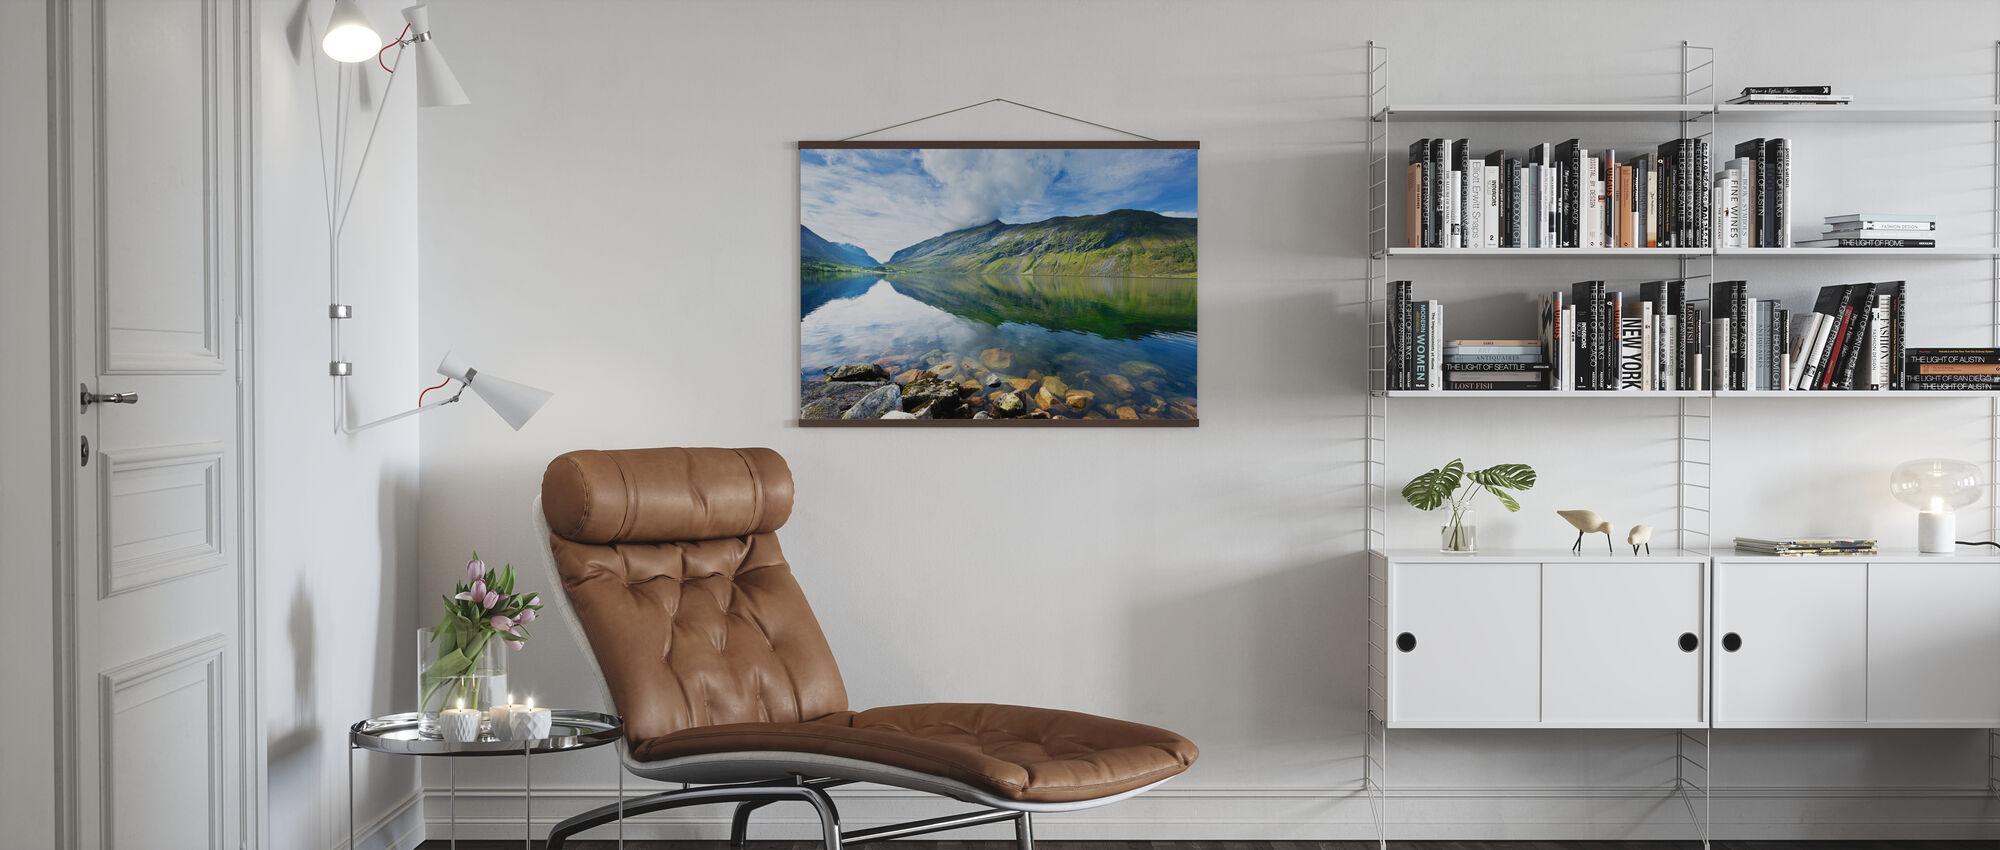 Eidsdal Lake in Geiranger, Norway II - Poster - Living Room